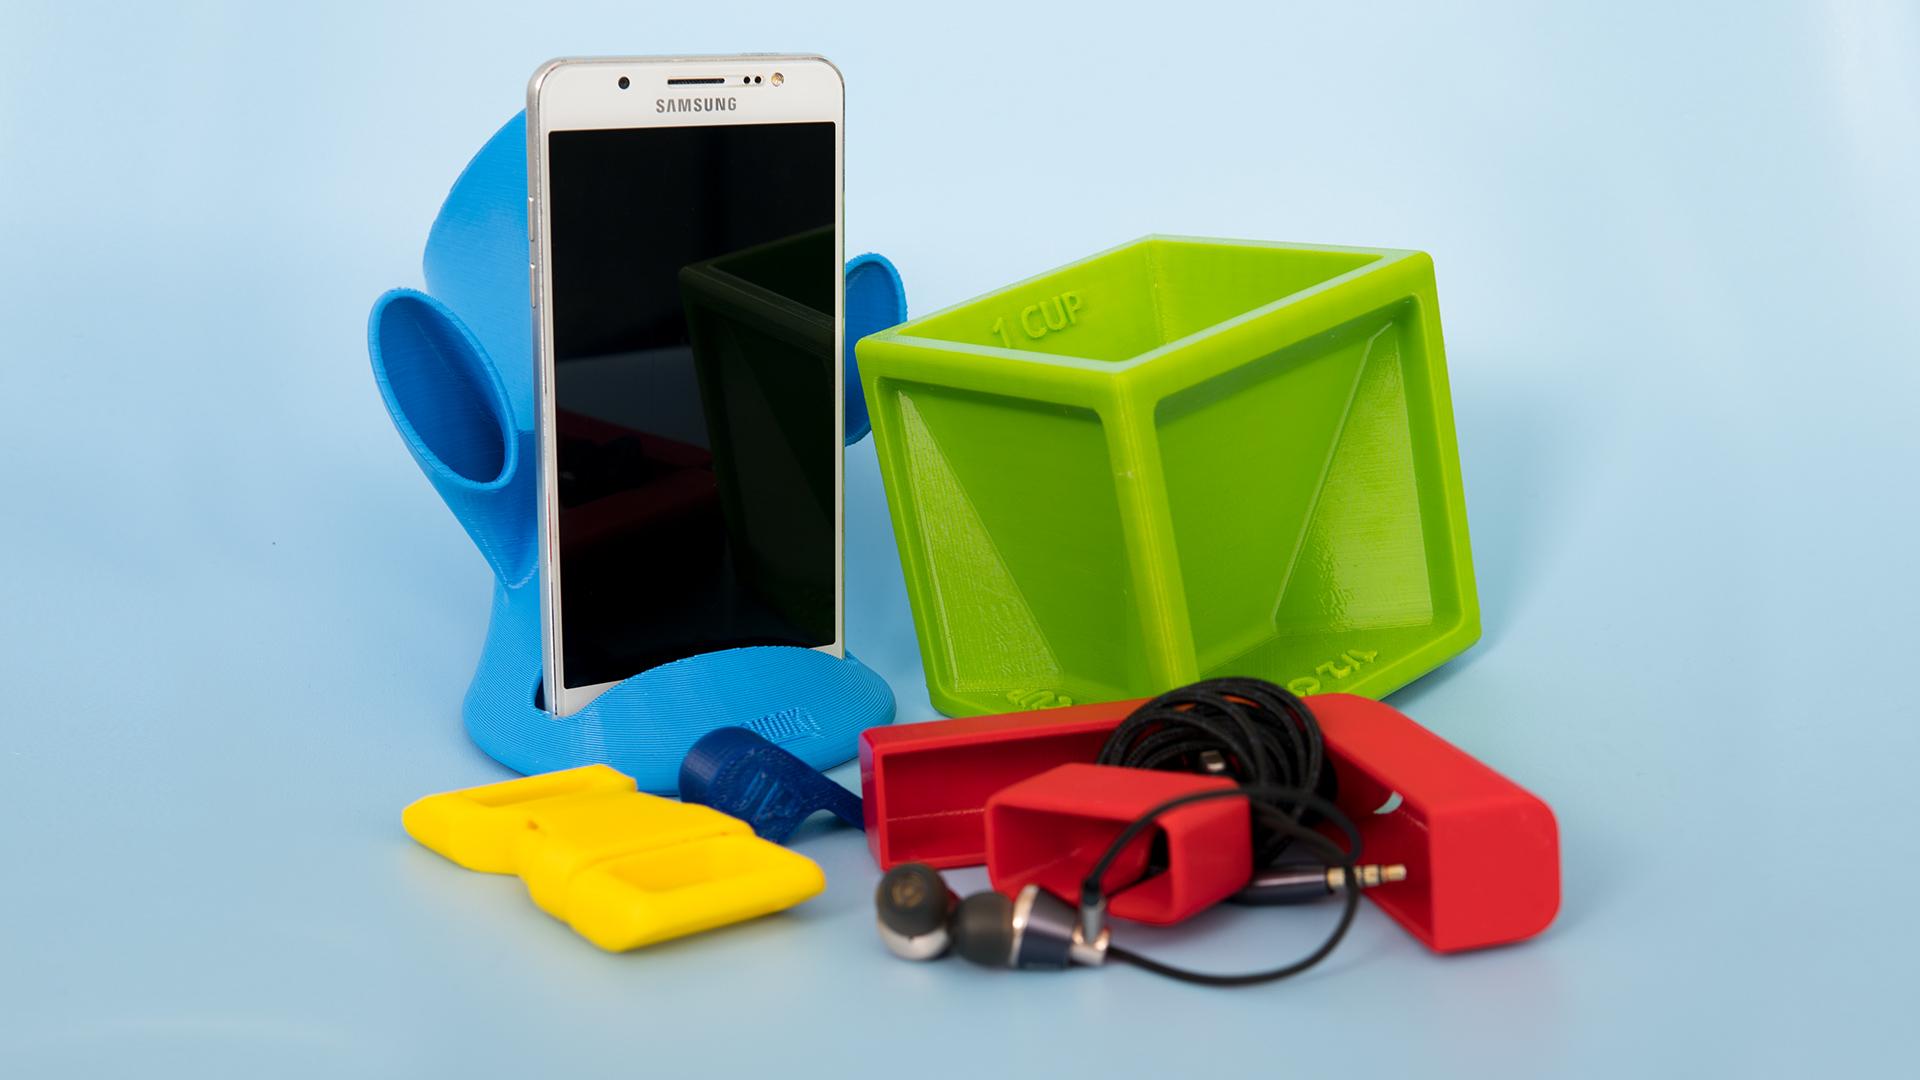 50 Coole 3D-Drucker-Vorlagen/3D-Druck-Ideen 2021 | All3DP